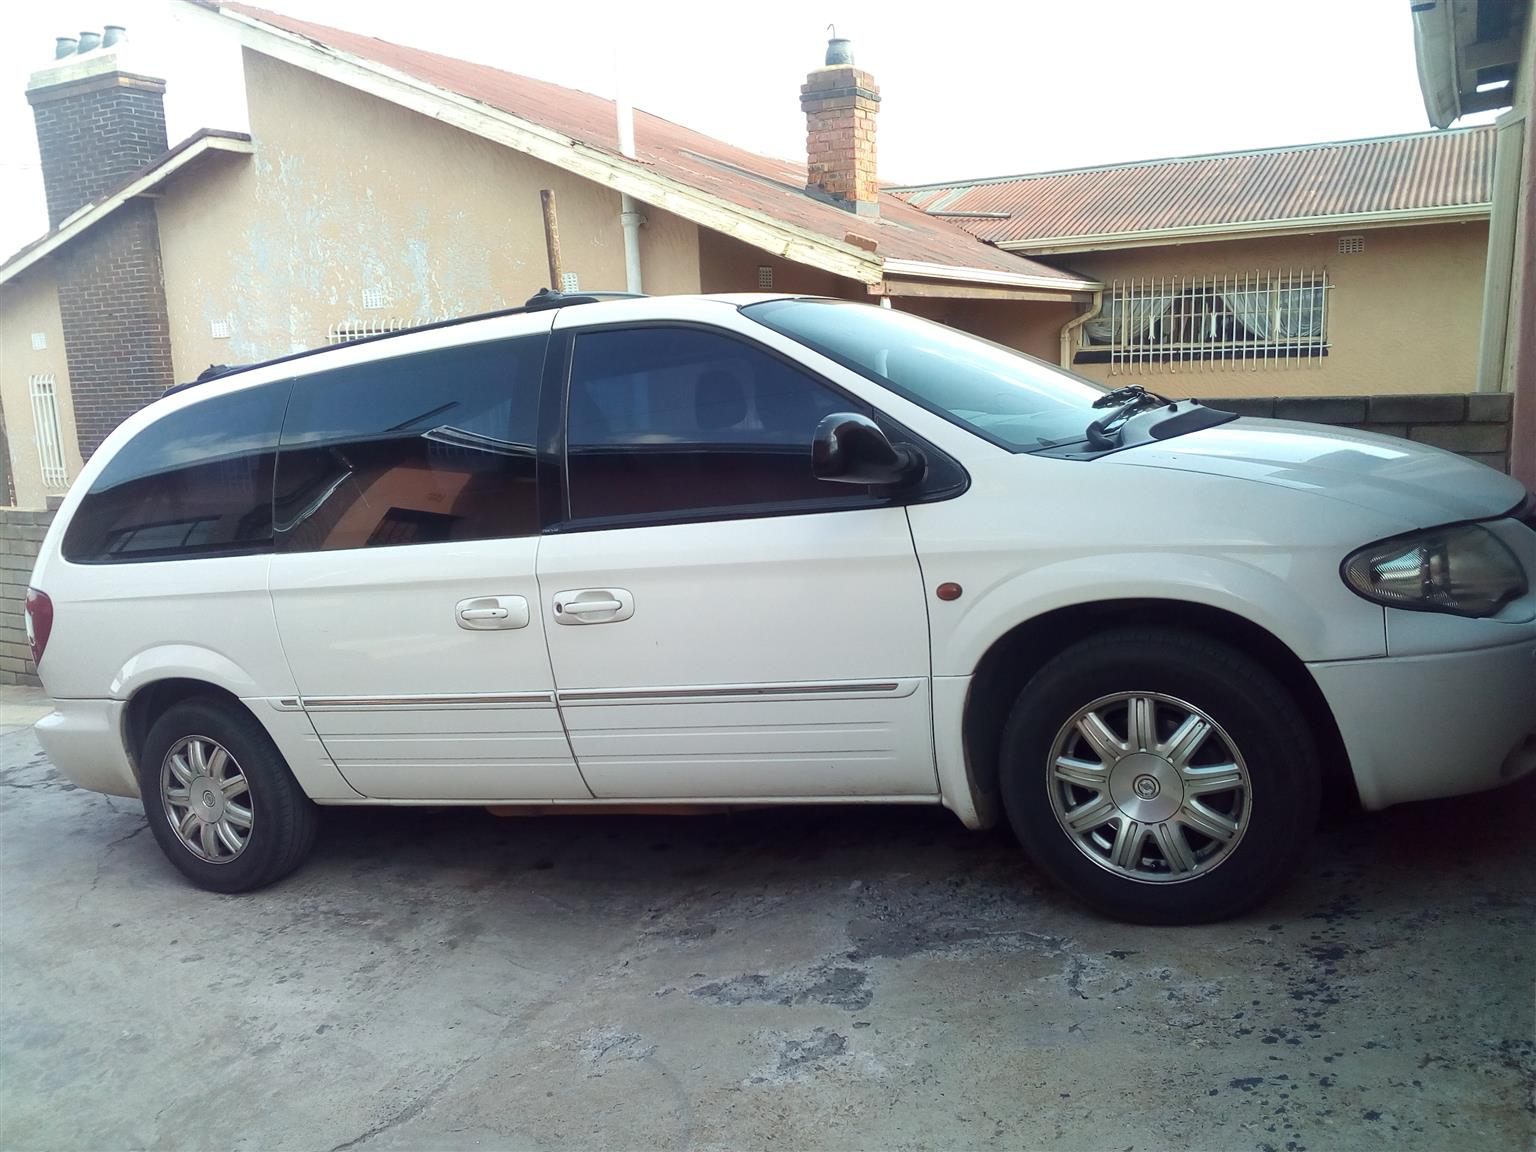 2006 Chrysler Grand Voyager 3.8 Limited